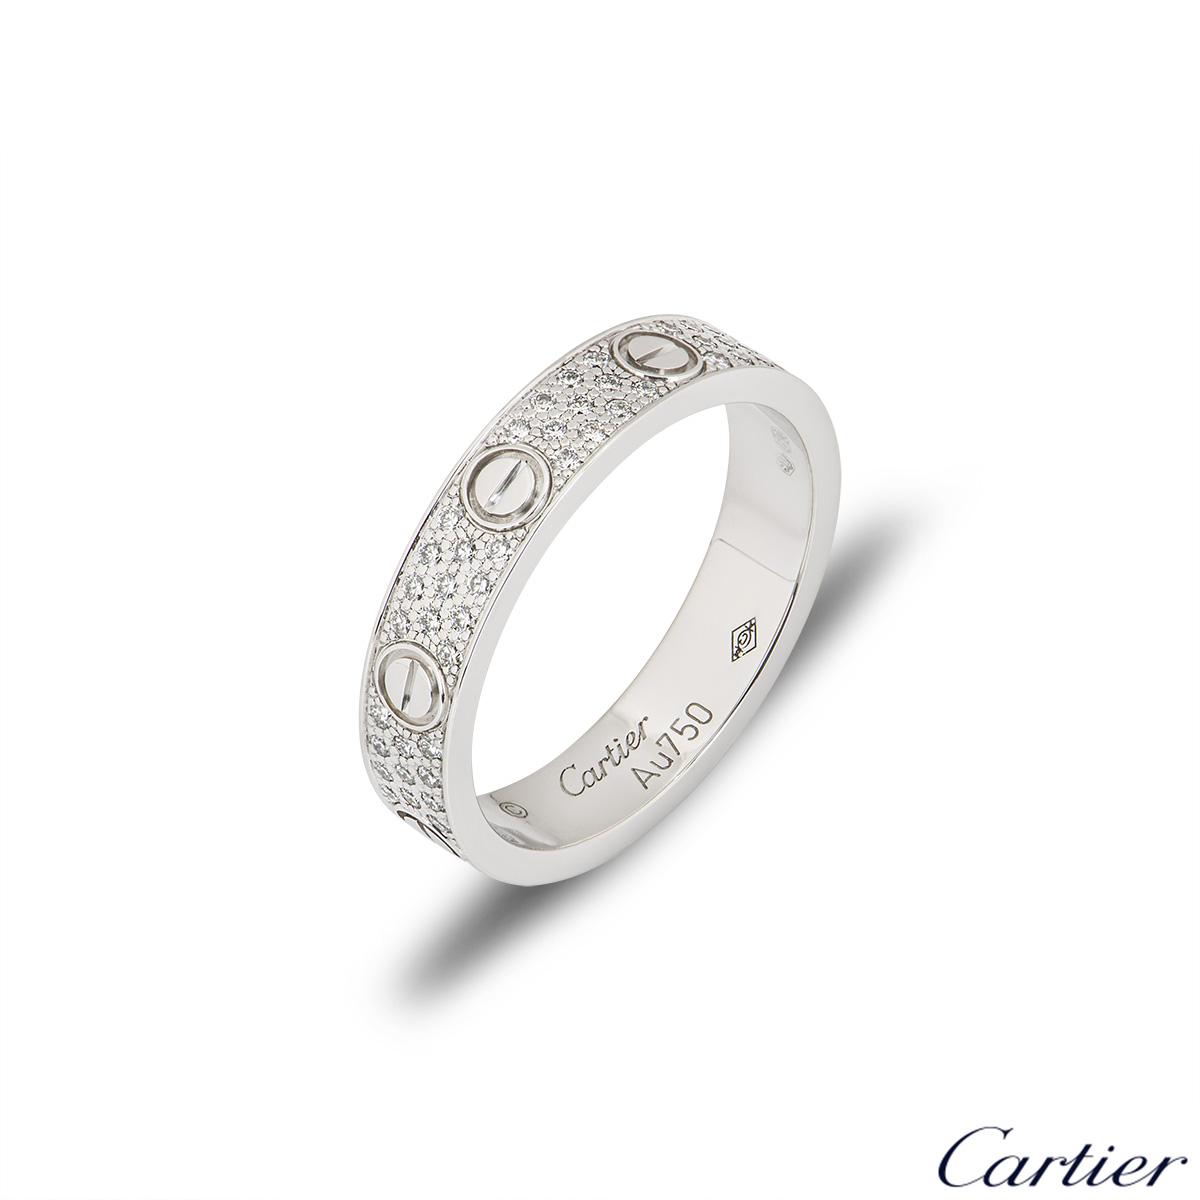 Cartier White Gold Pave Diamond Wedding Love Ring Size 51 B4083400